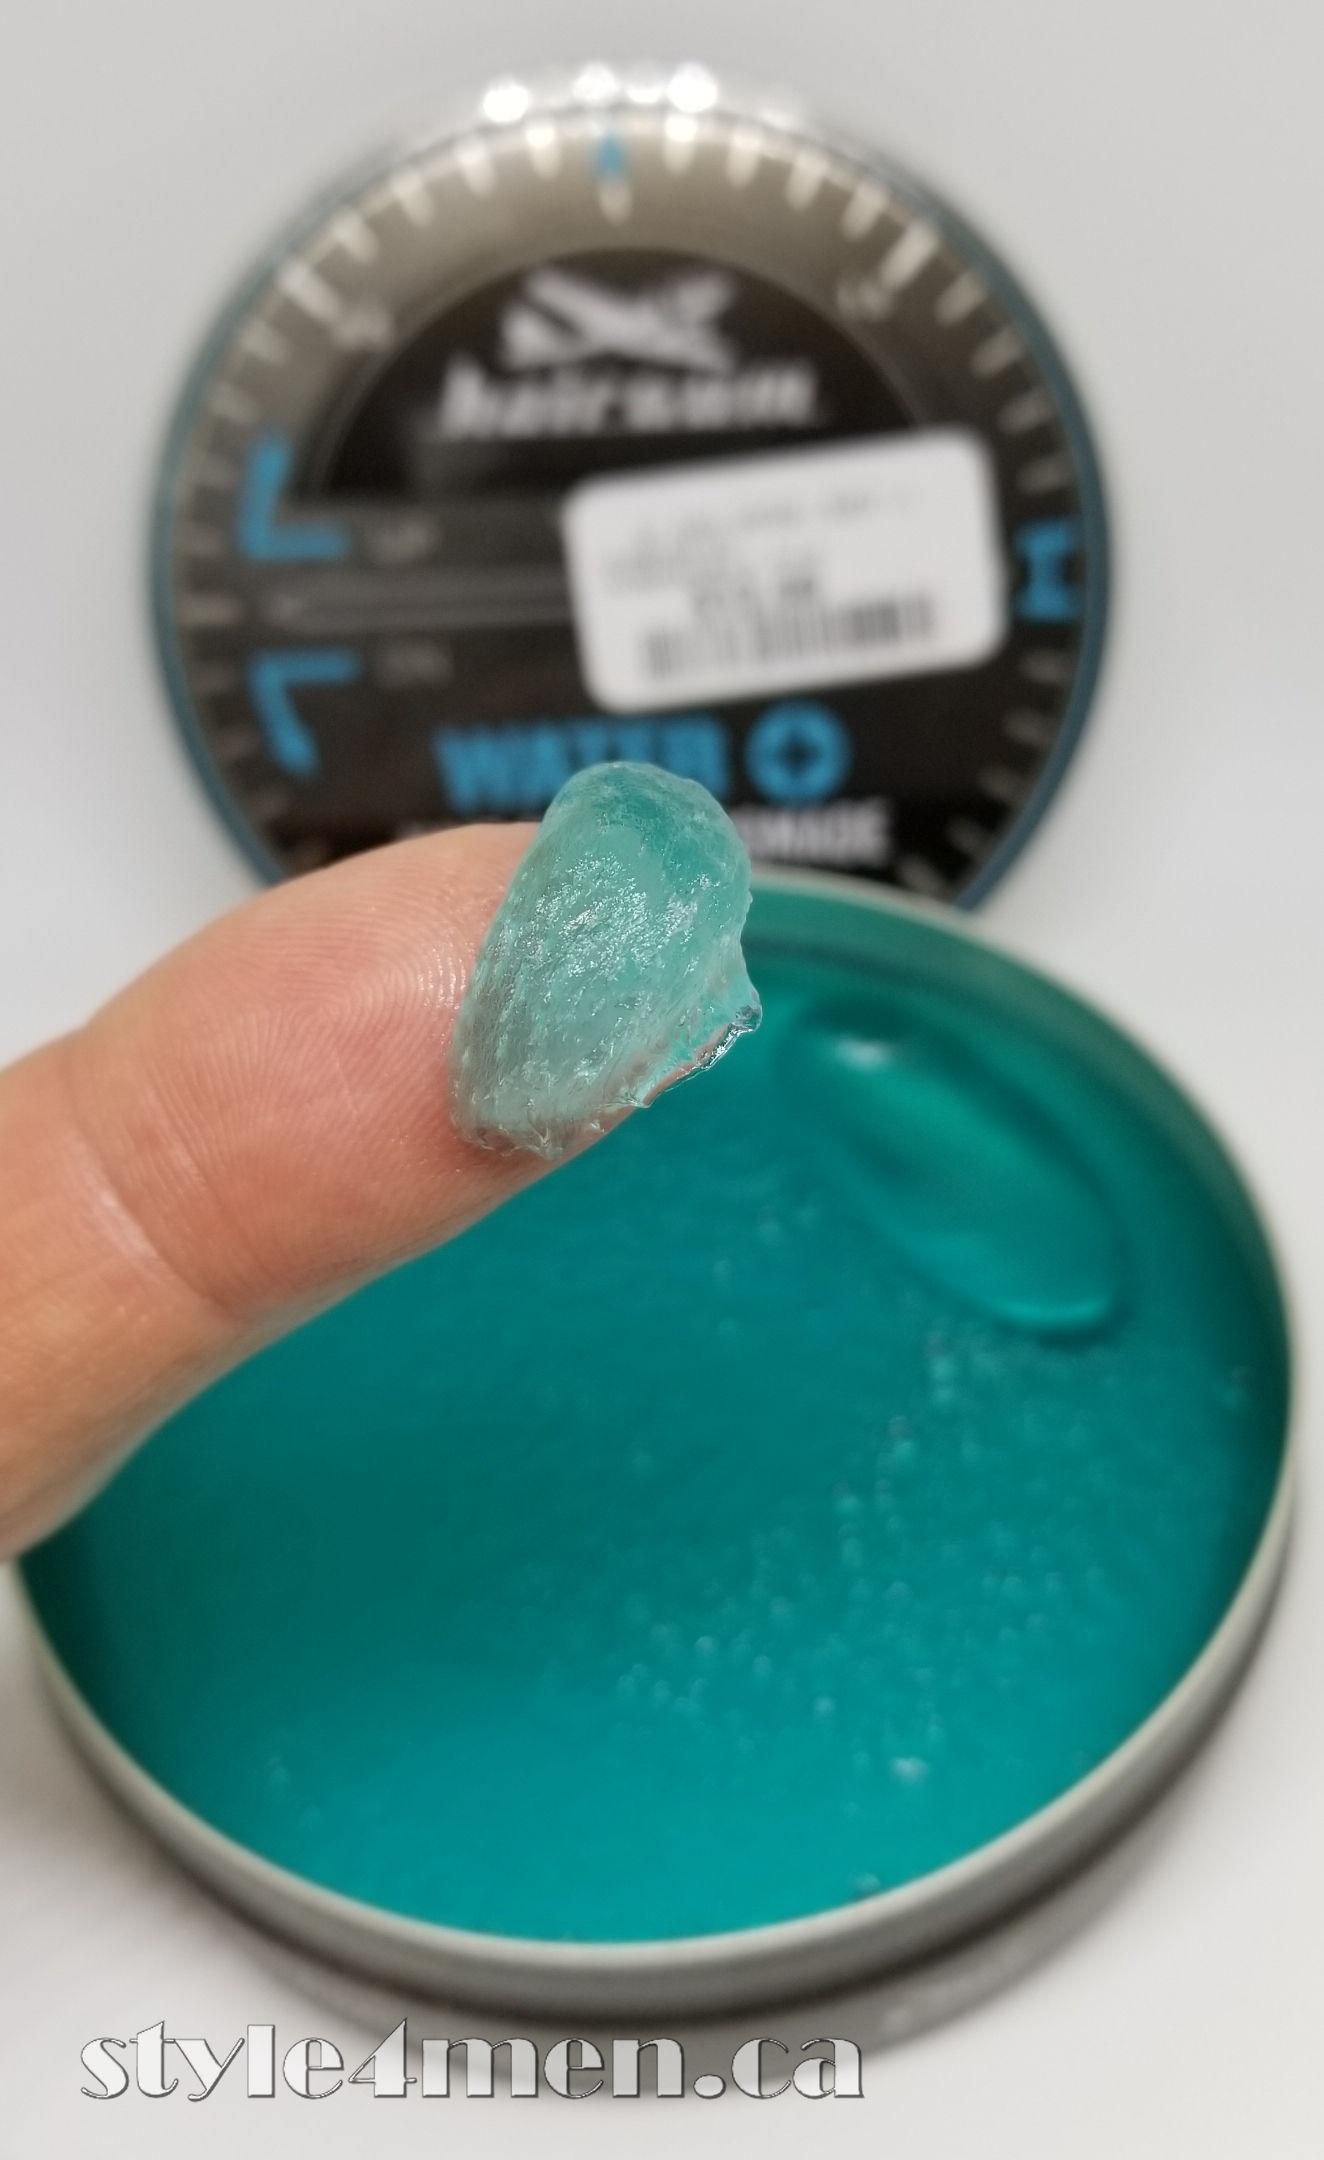 Hairgum Water Plus